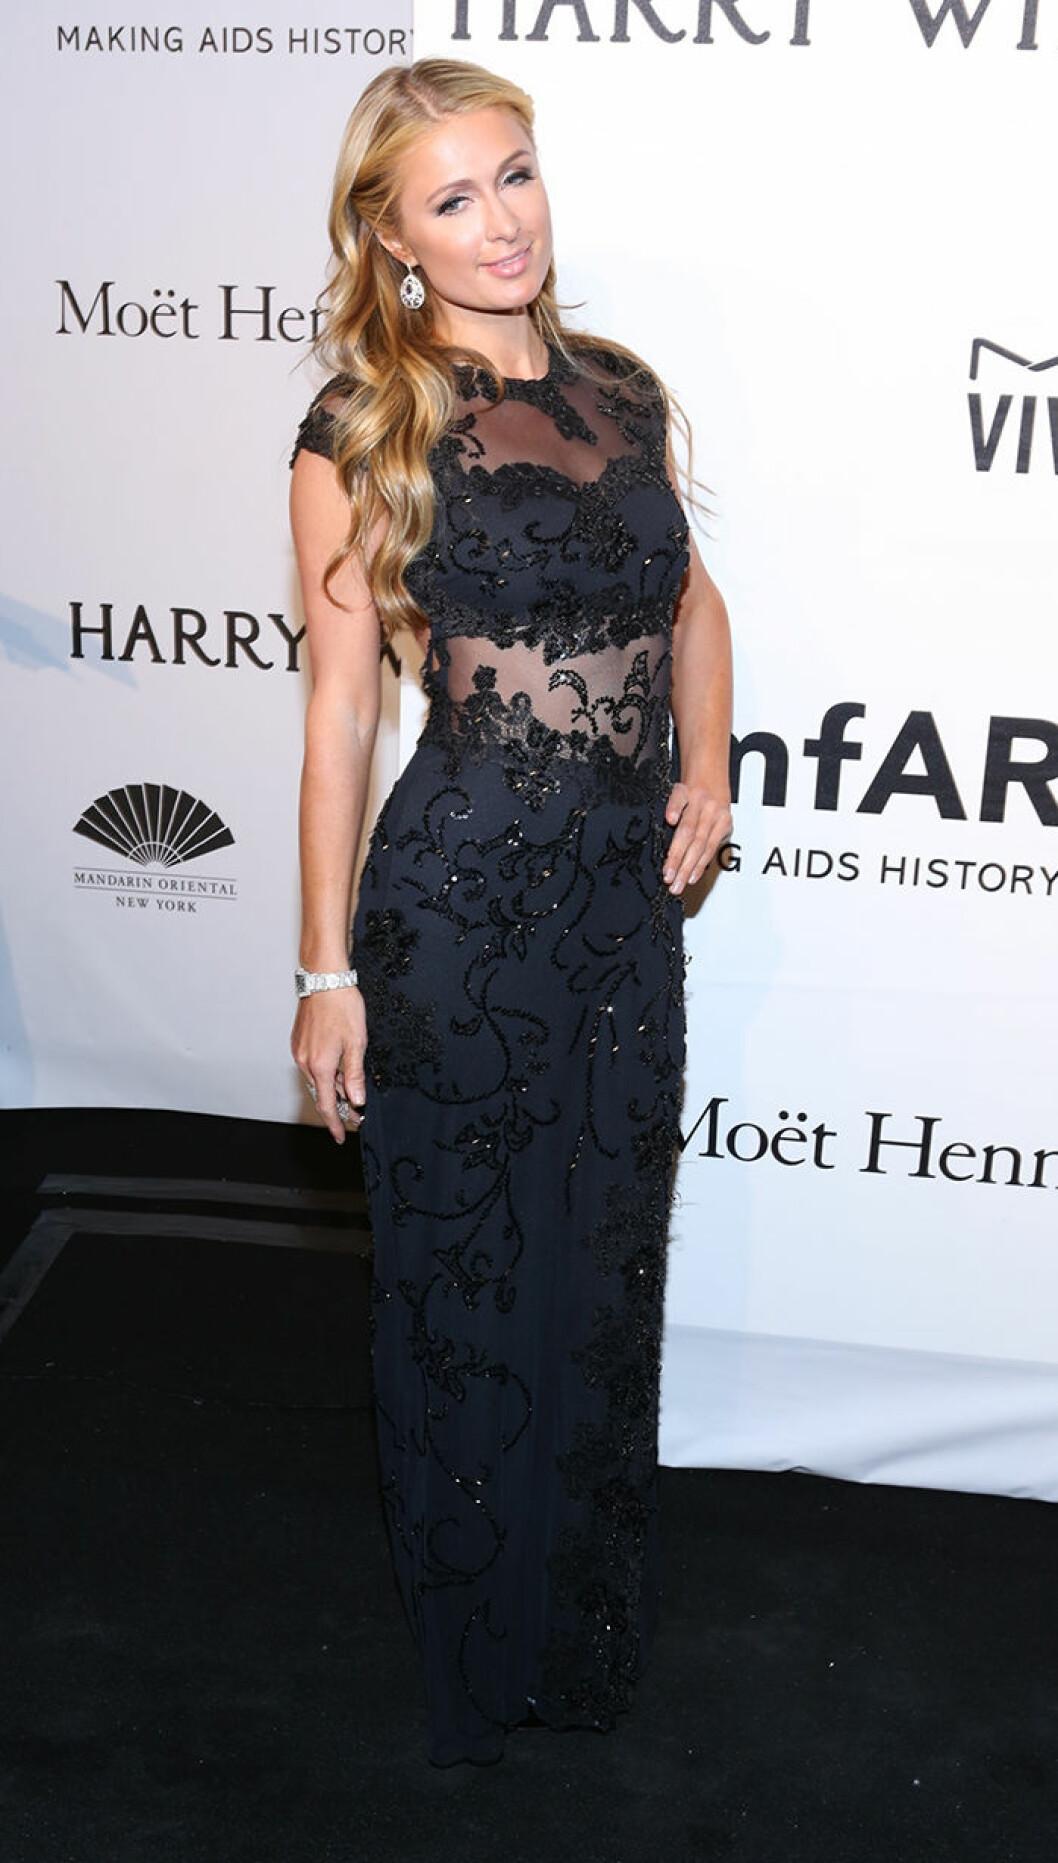 Paris Hilton seen attending the 2015 amfAR New York Gala at Cipriani Wall Street